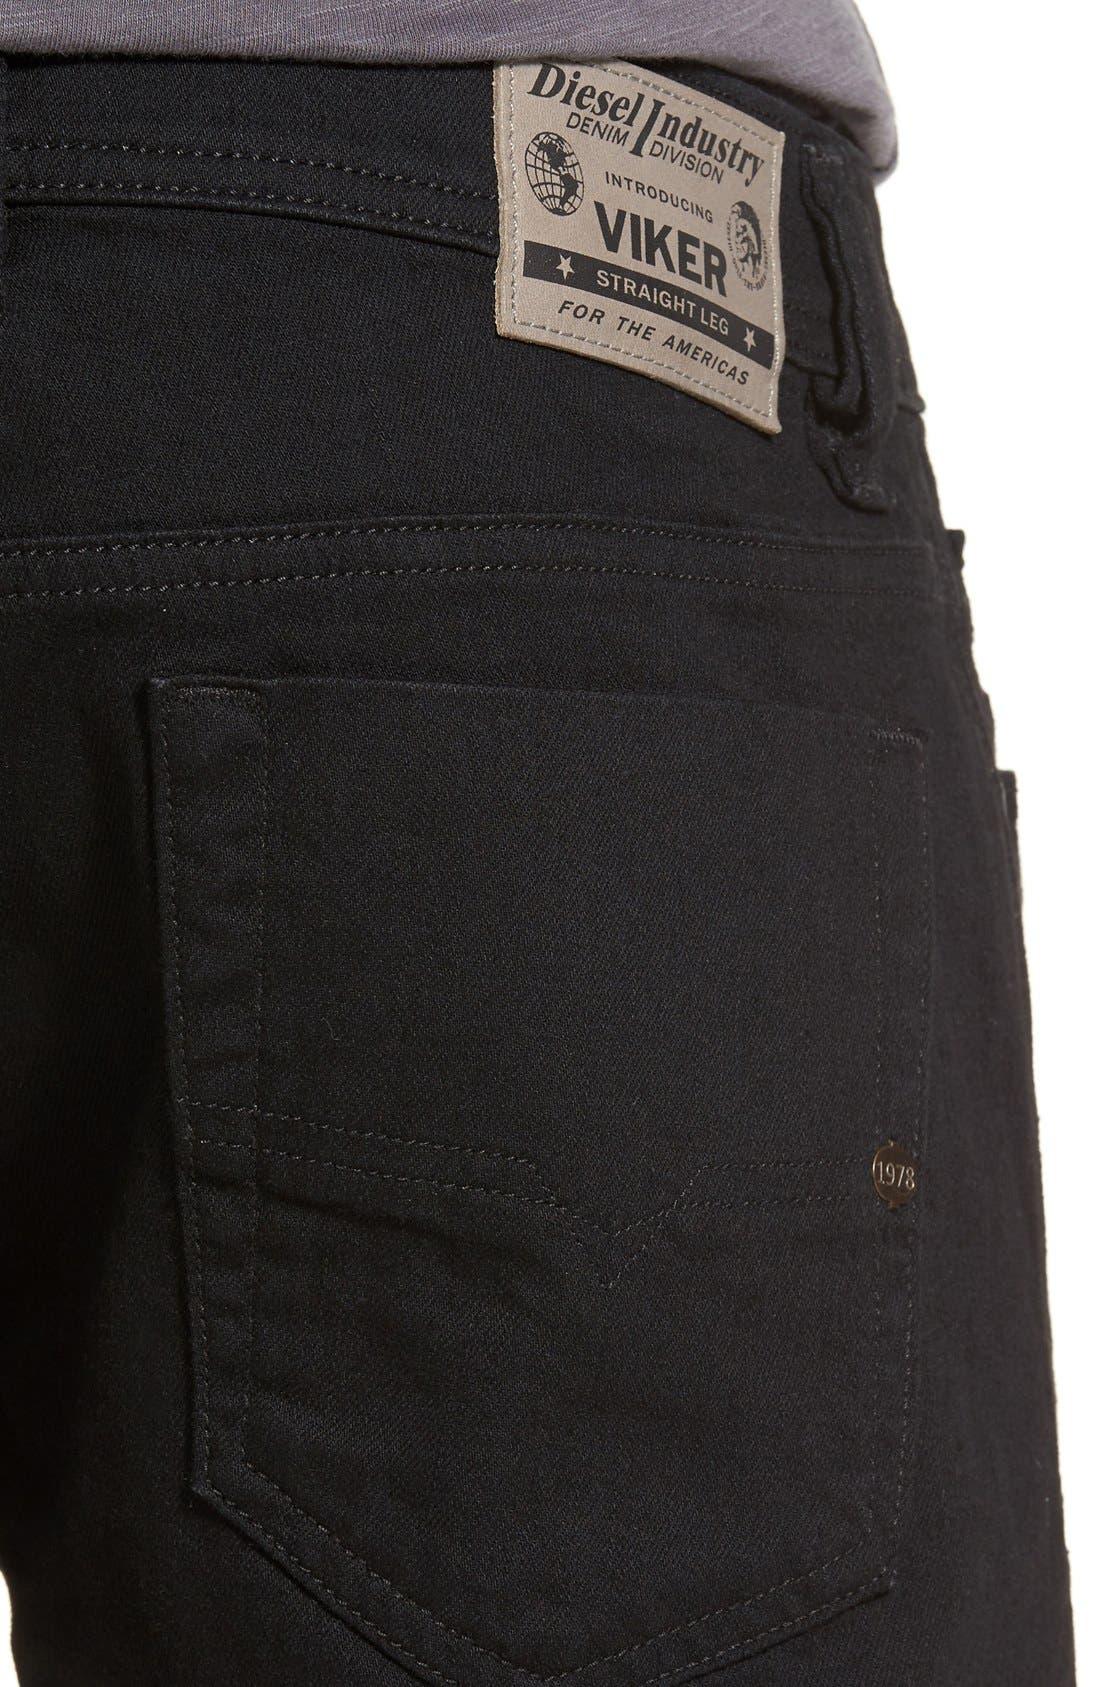 'Viker' Straight Fit Jeans,                             Alternate thumbnail 2, color,                             008